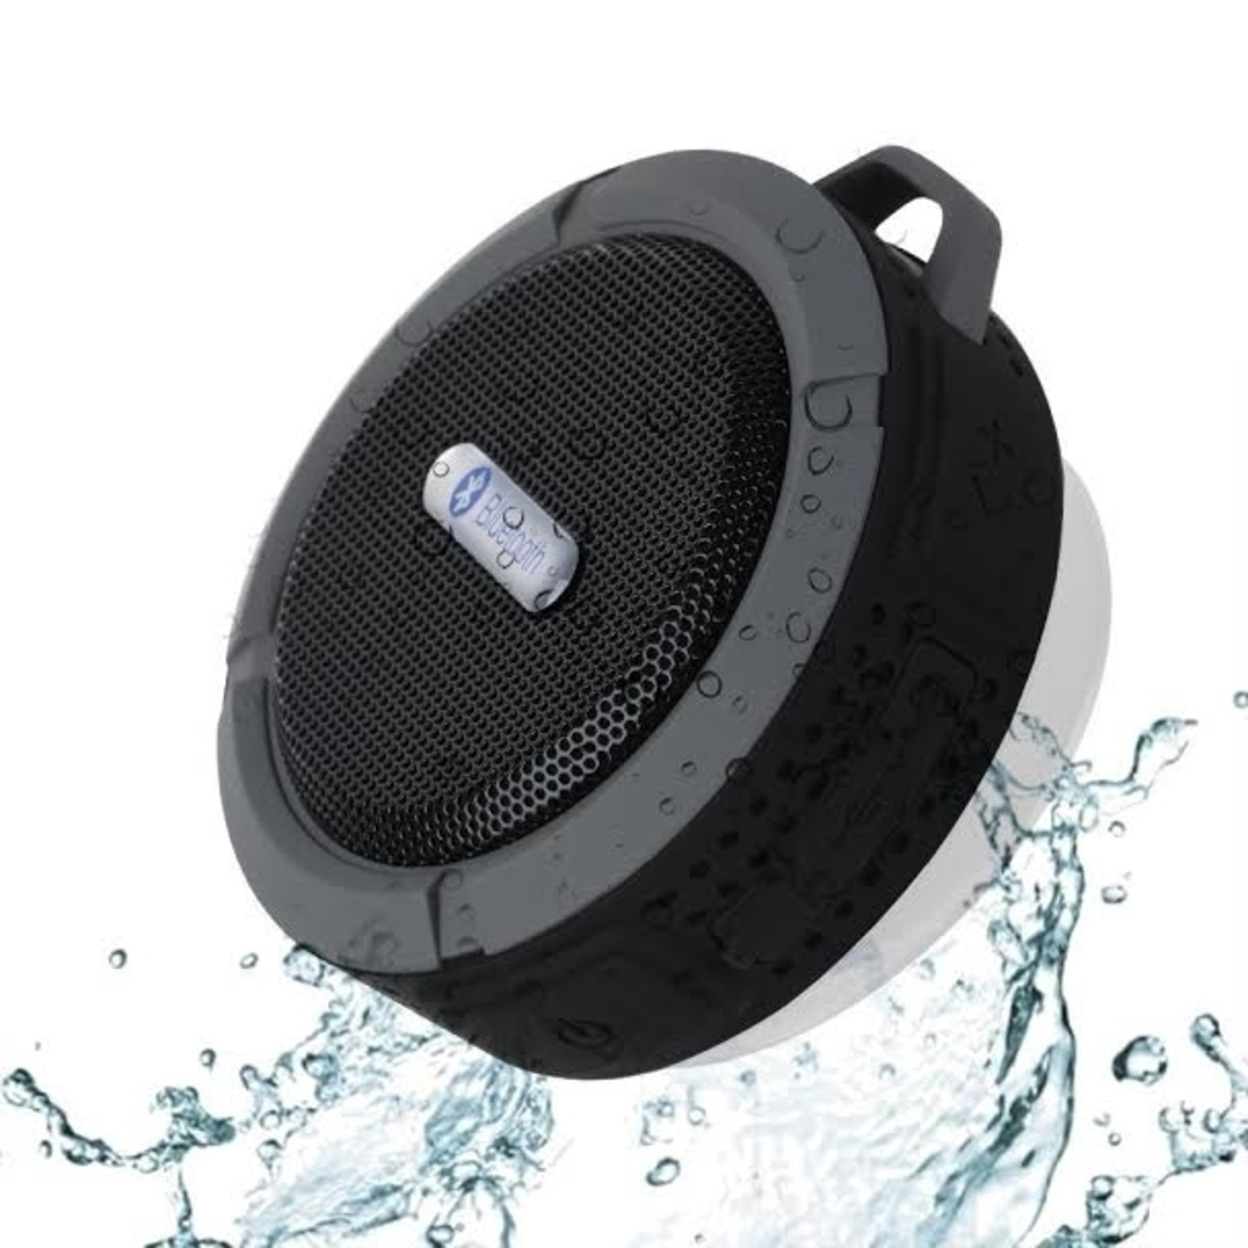 Portable Waterproof Bluetooth Speaker - Red 563cfc1b6e3d6f60598b4b97